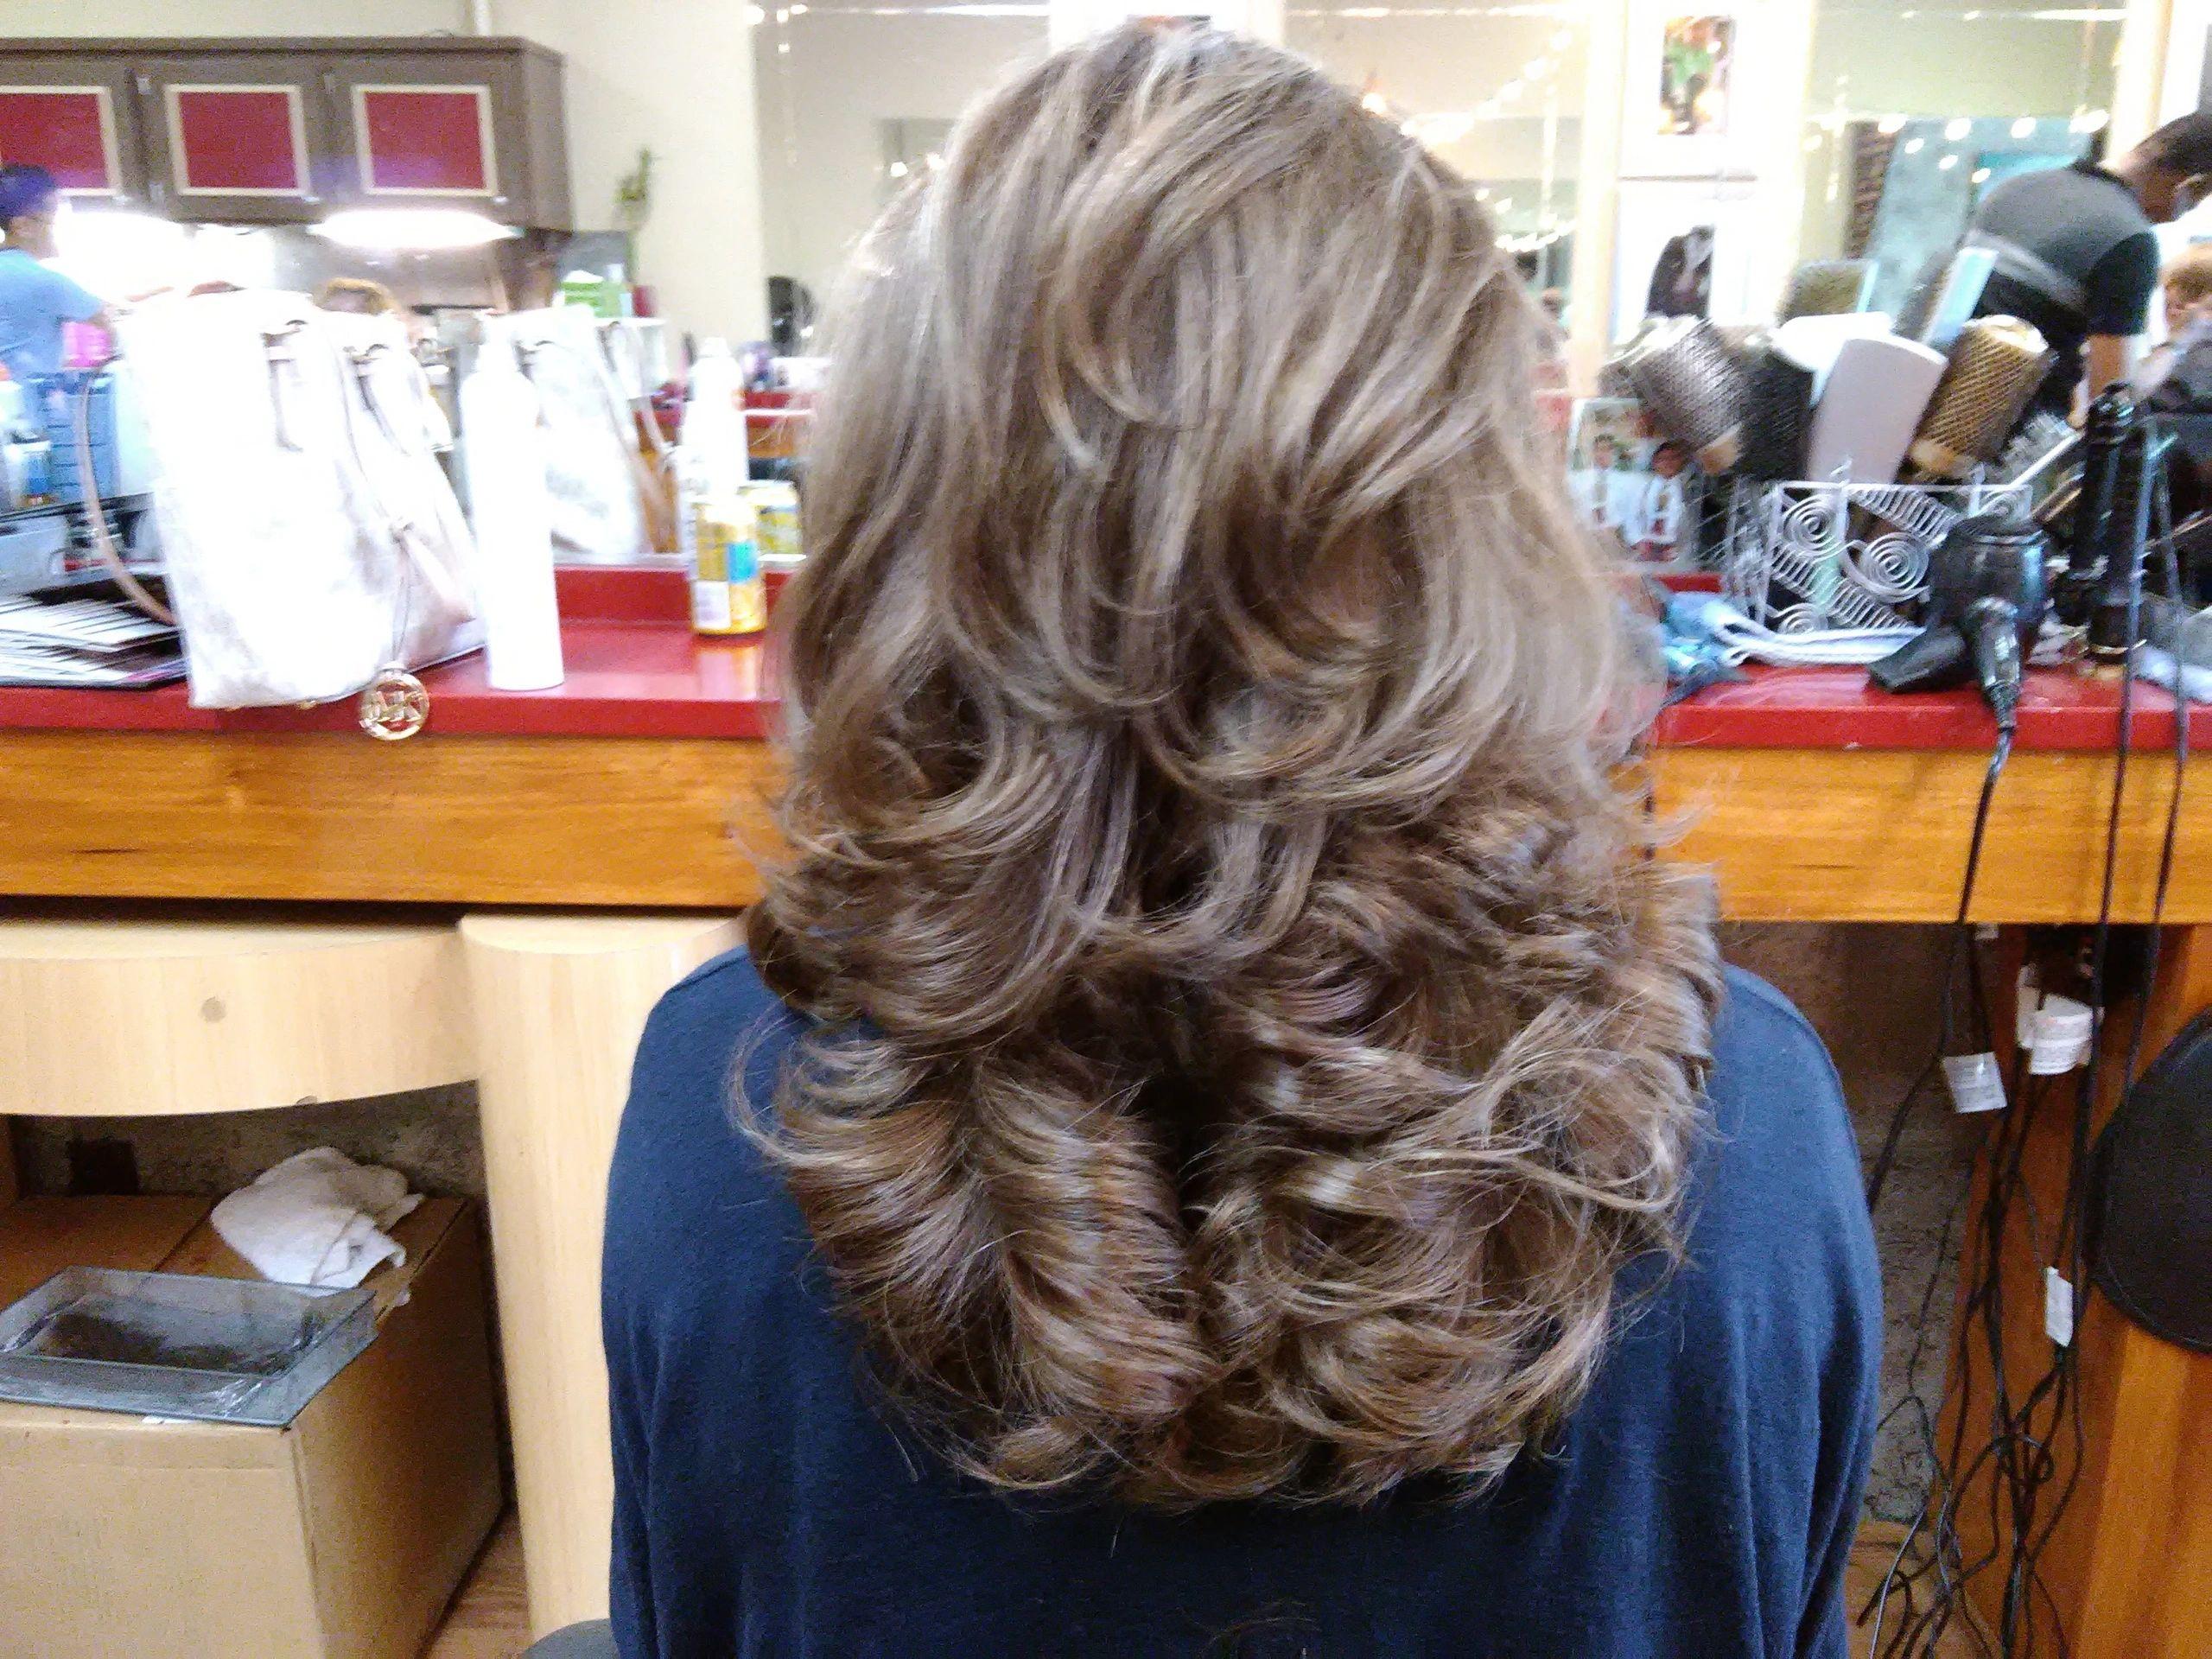 Hair Salon Barber Shop Toppers Salon Tallahassee Florida